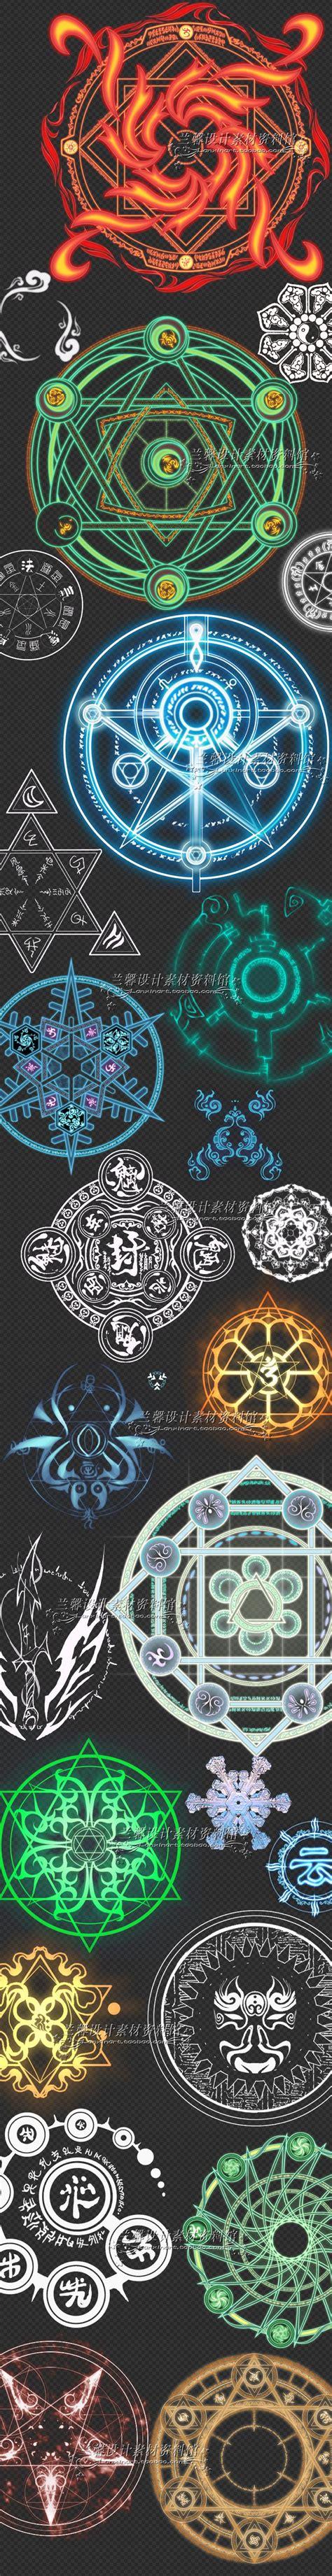 Kaos Anime Seal An9a1 alchemy sacred geometry alchemy sacred